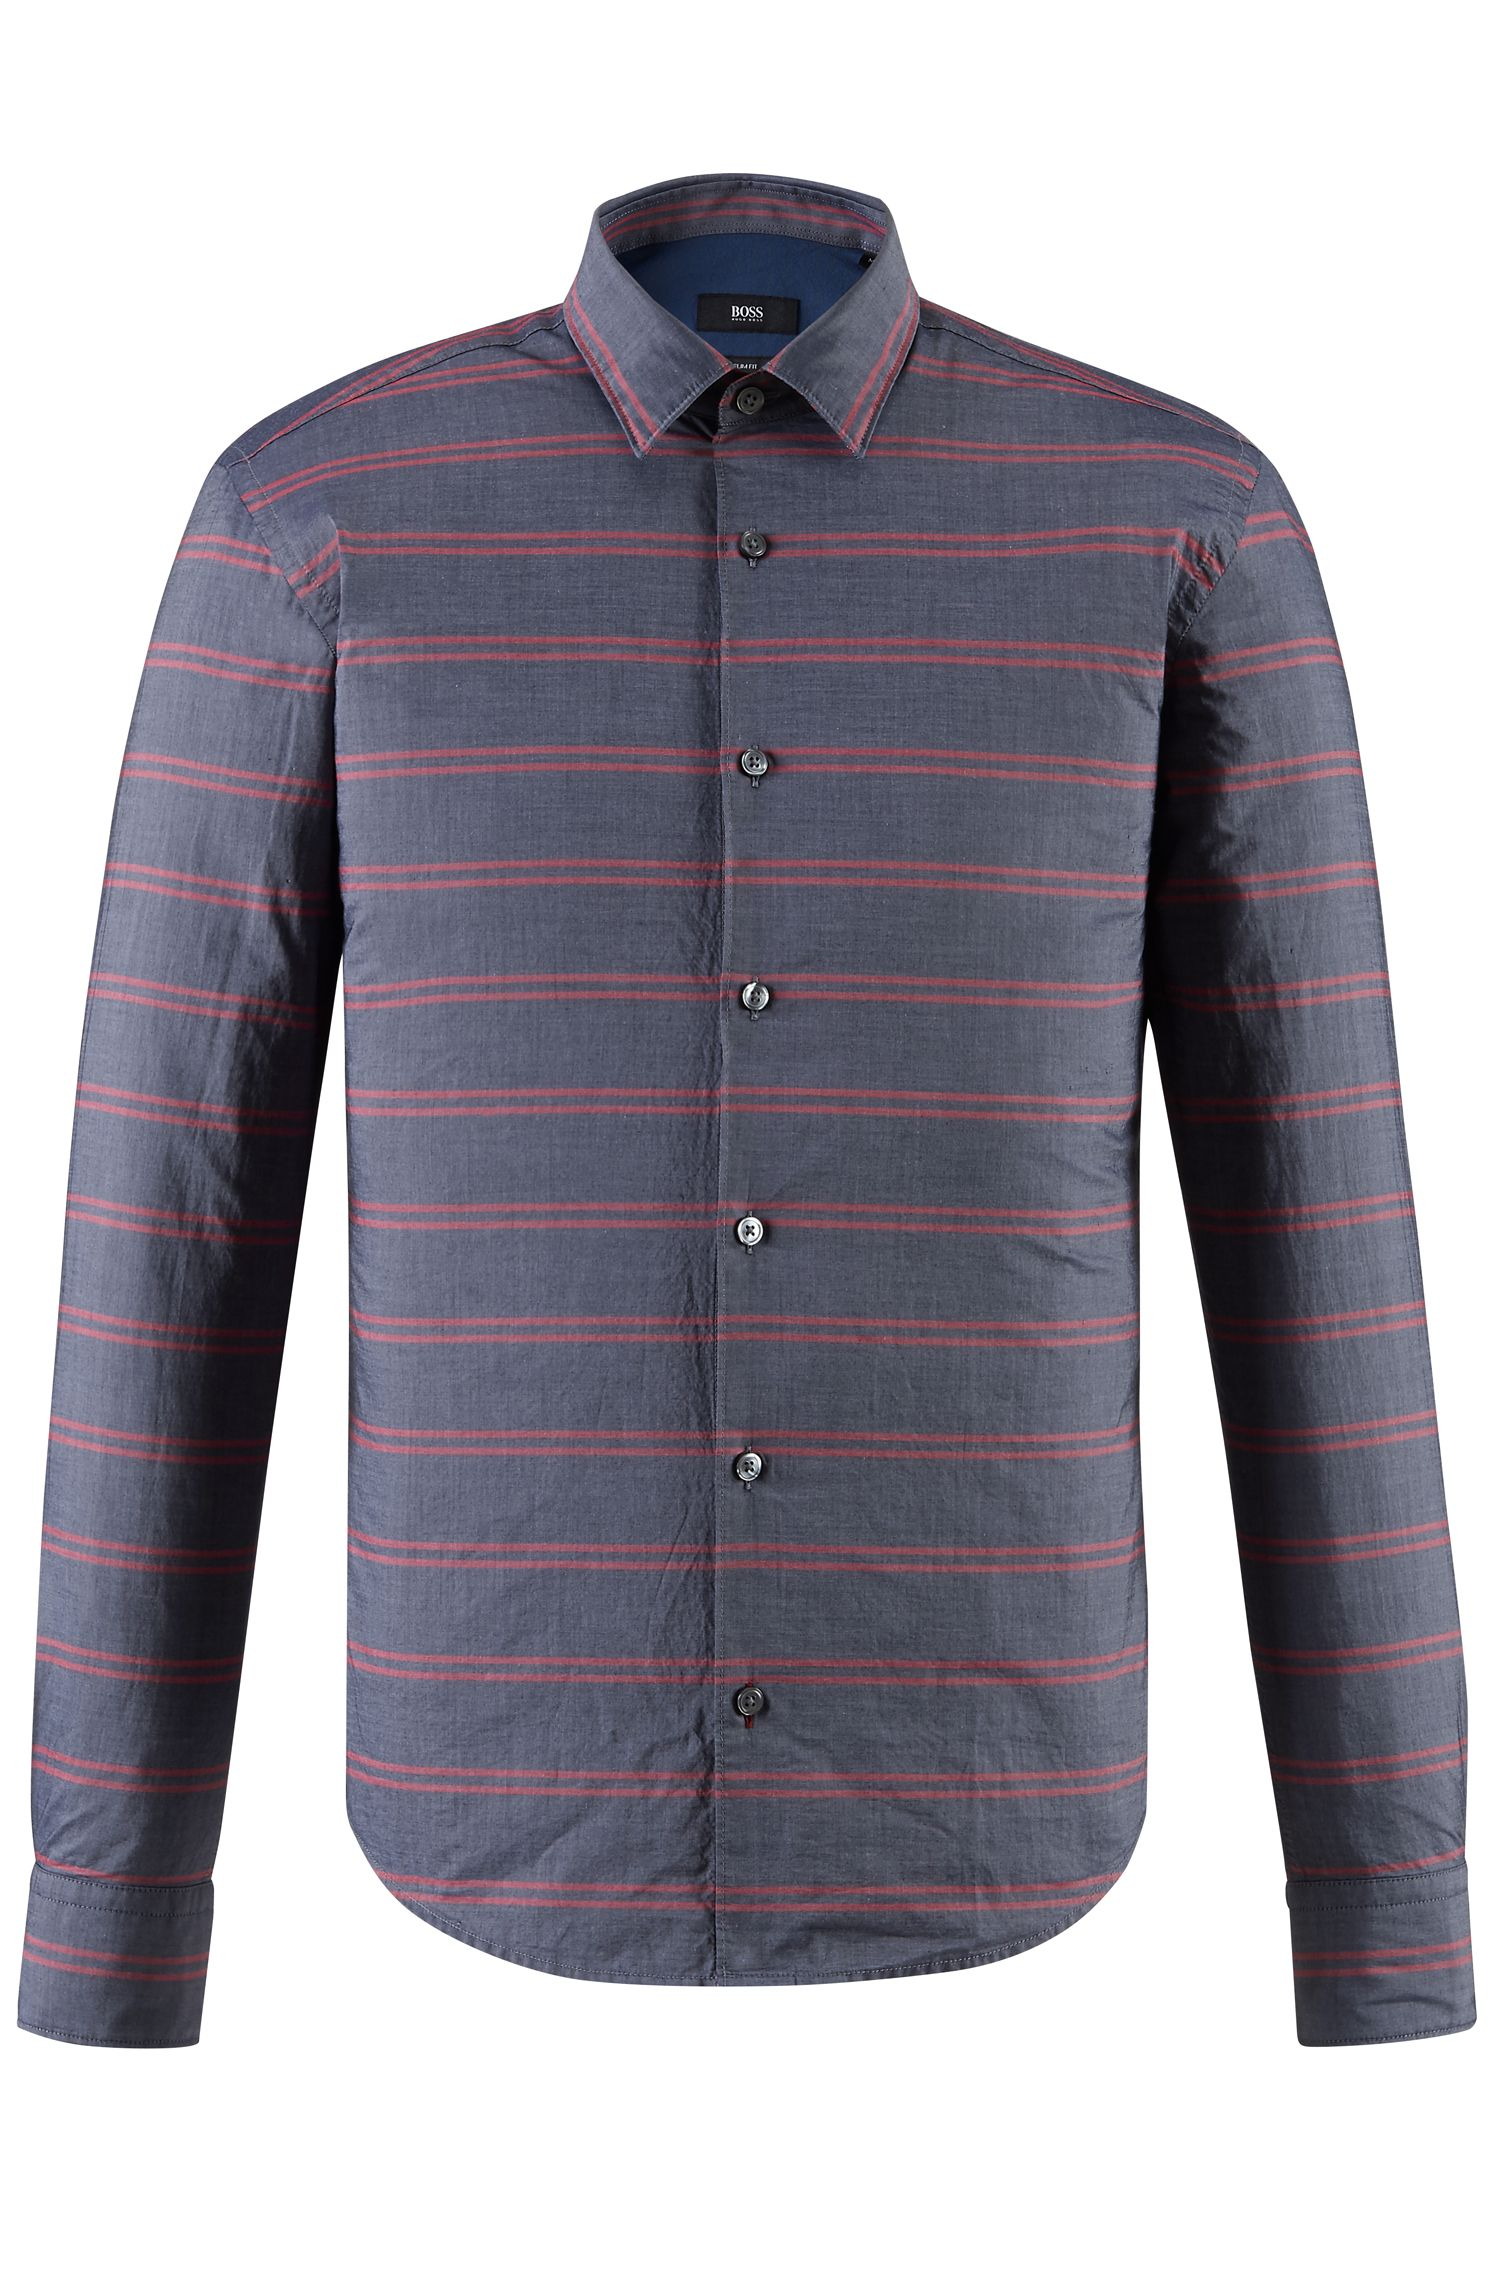 Striped Cotton Button Down Shirt, Slim Fit | Reid F